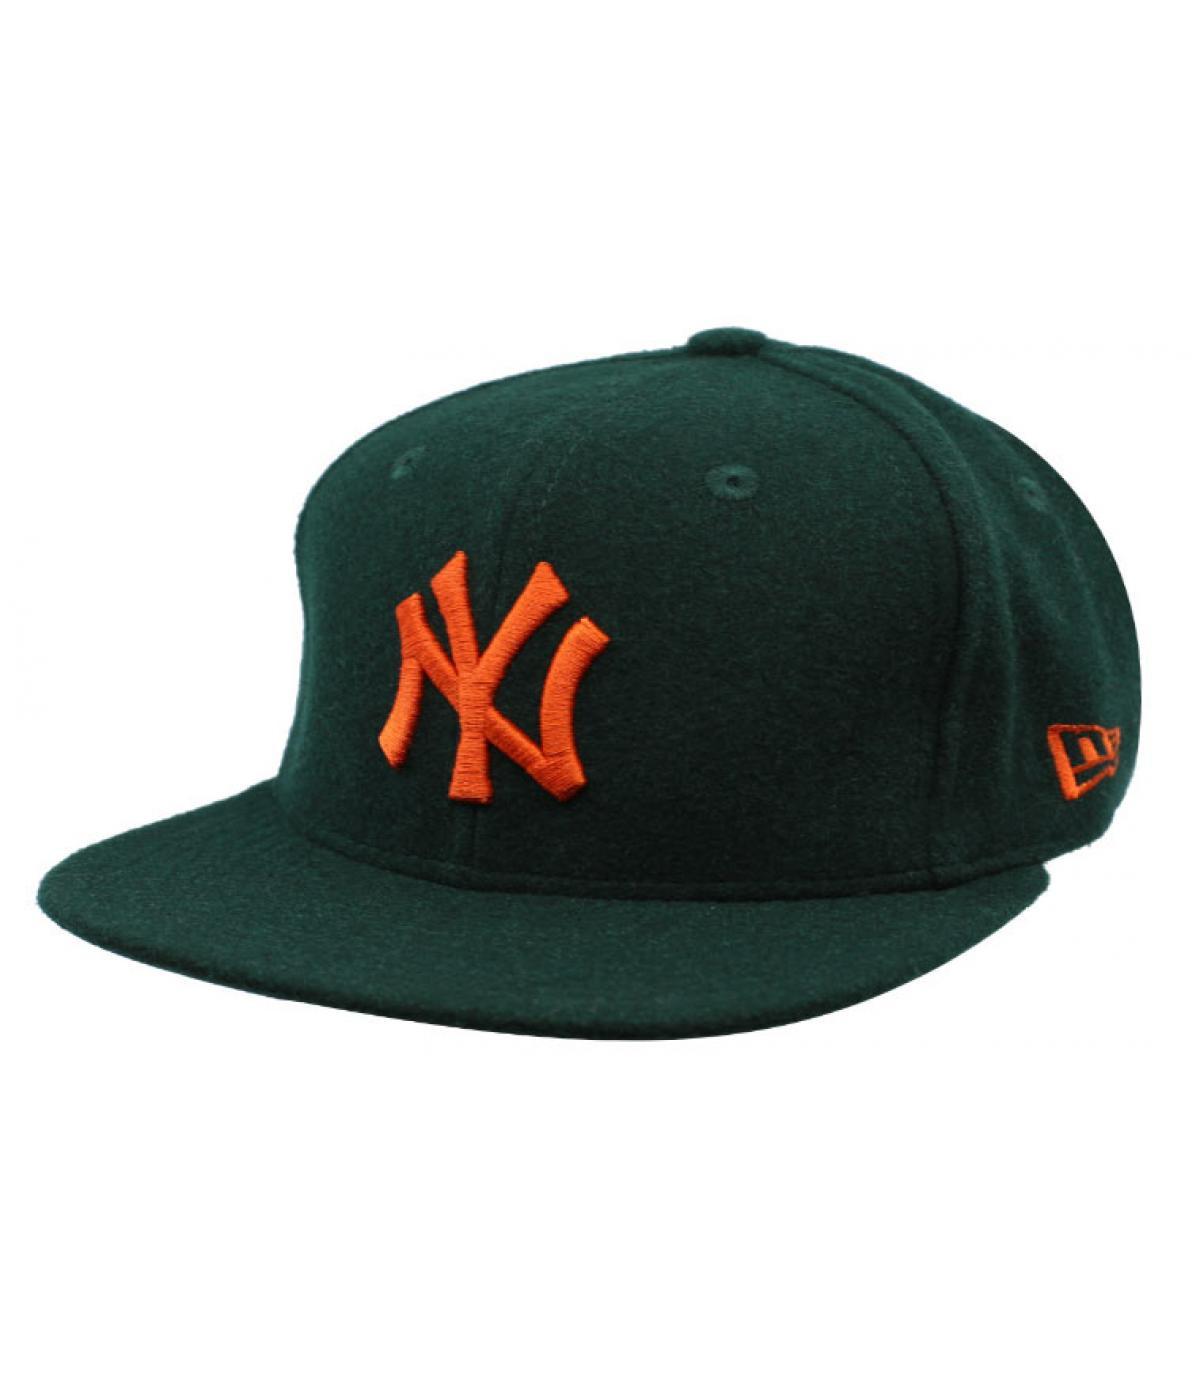 Dettagli Winter Utility NY Melton 9Fifty dark green orange - image 2